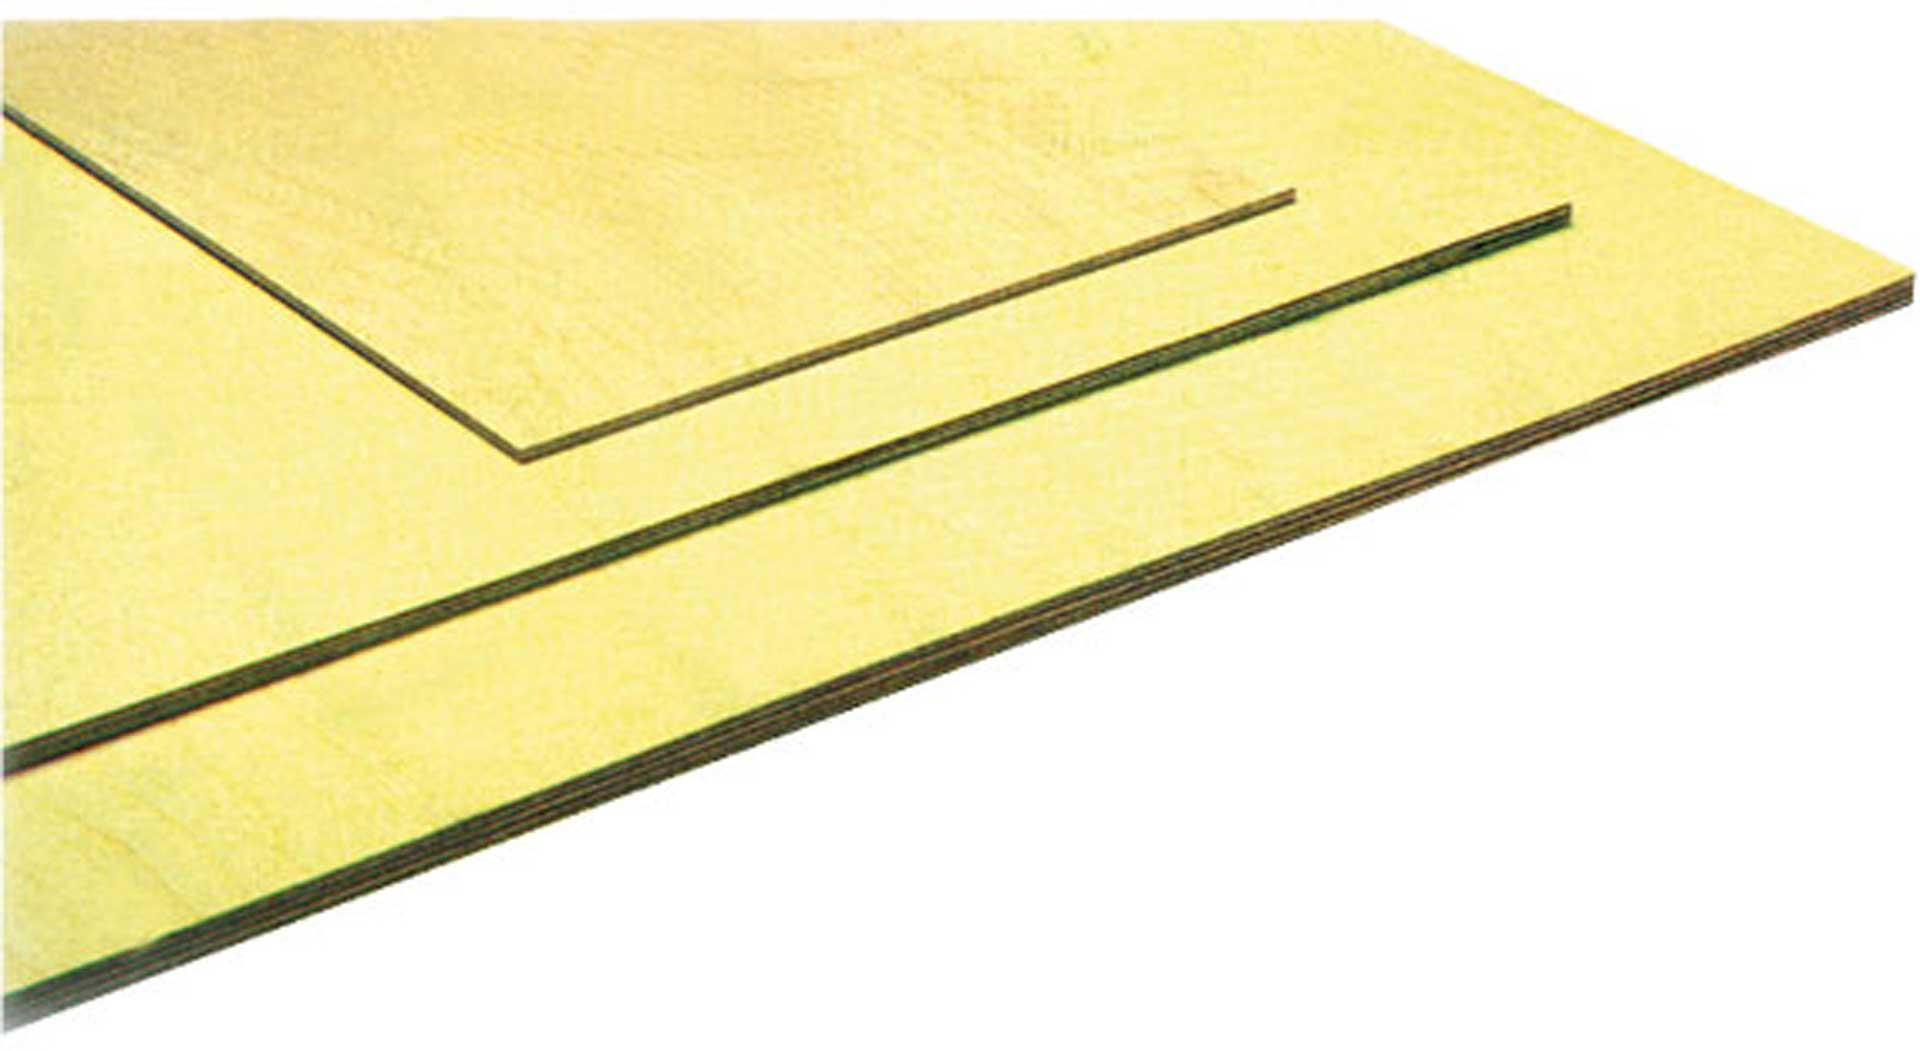 MODELLBAU LINDINGER BIRCH-SPERRY 5,0/300/500MM